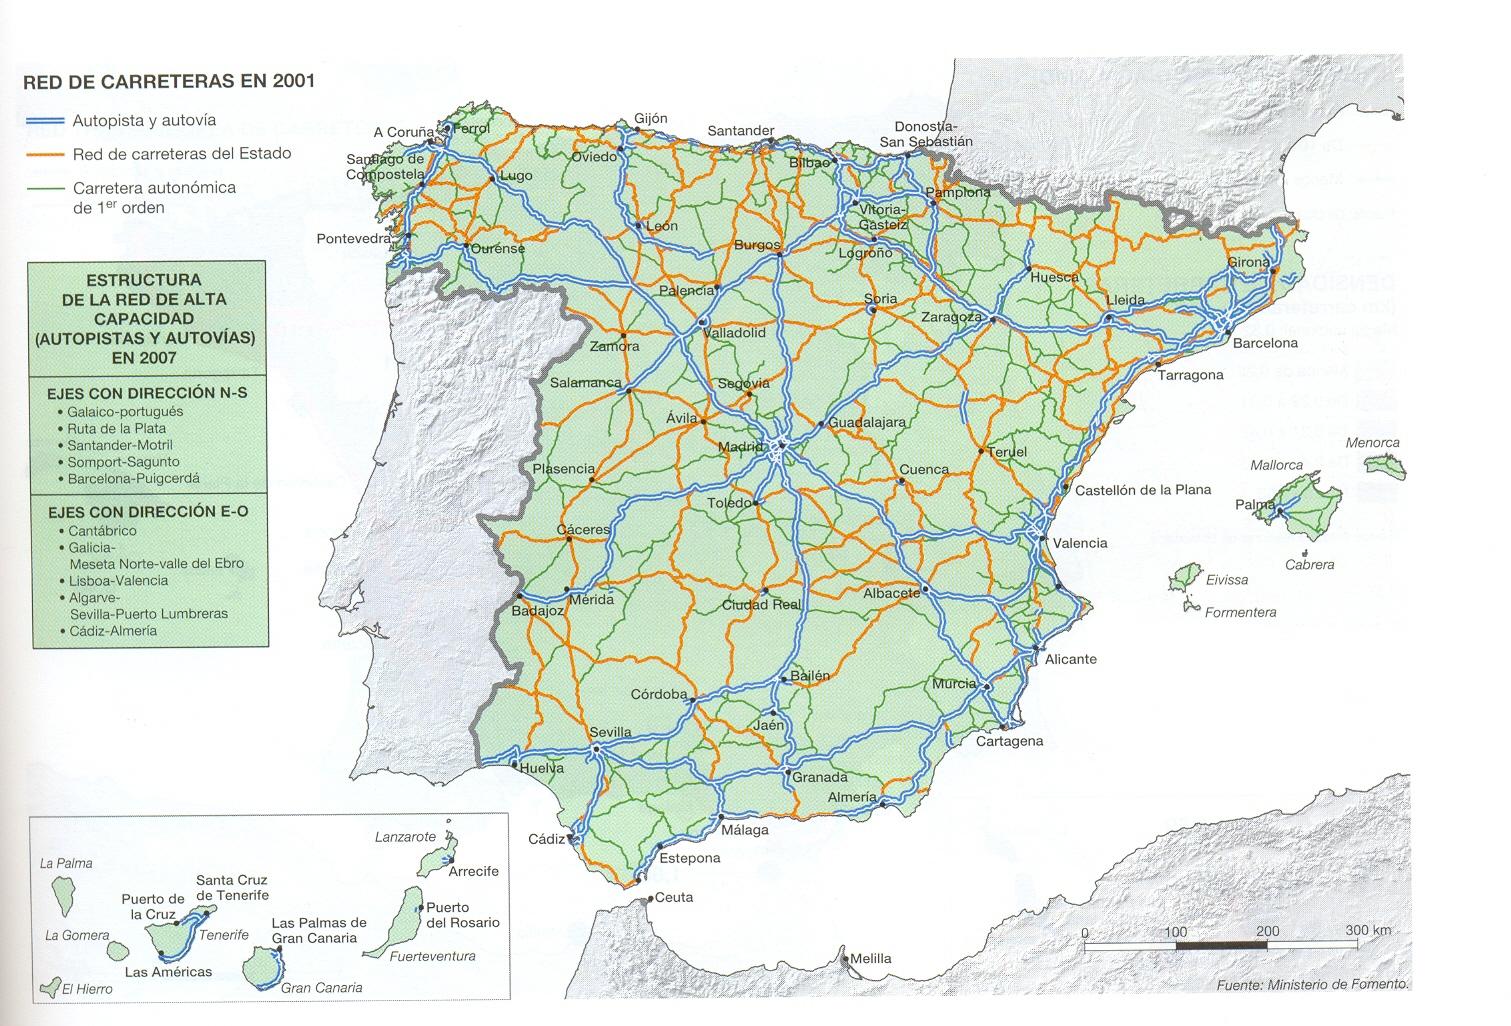 Xeografa 2BAC Mapa de Carreteras